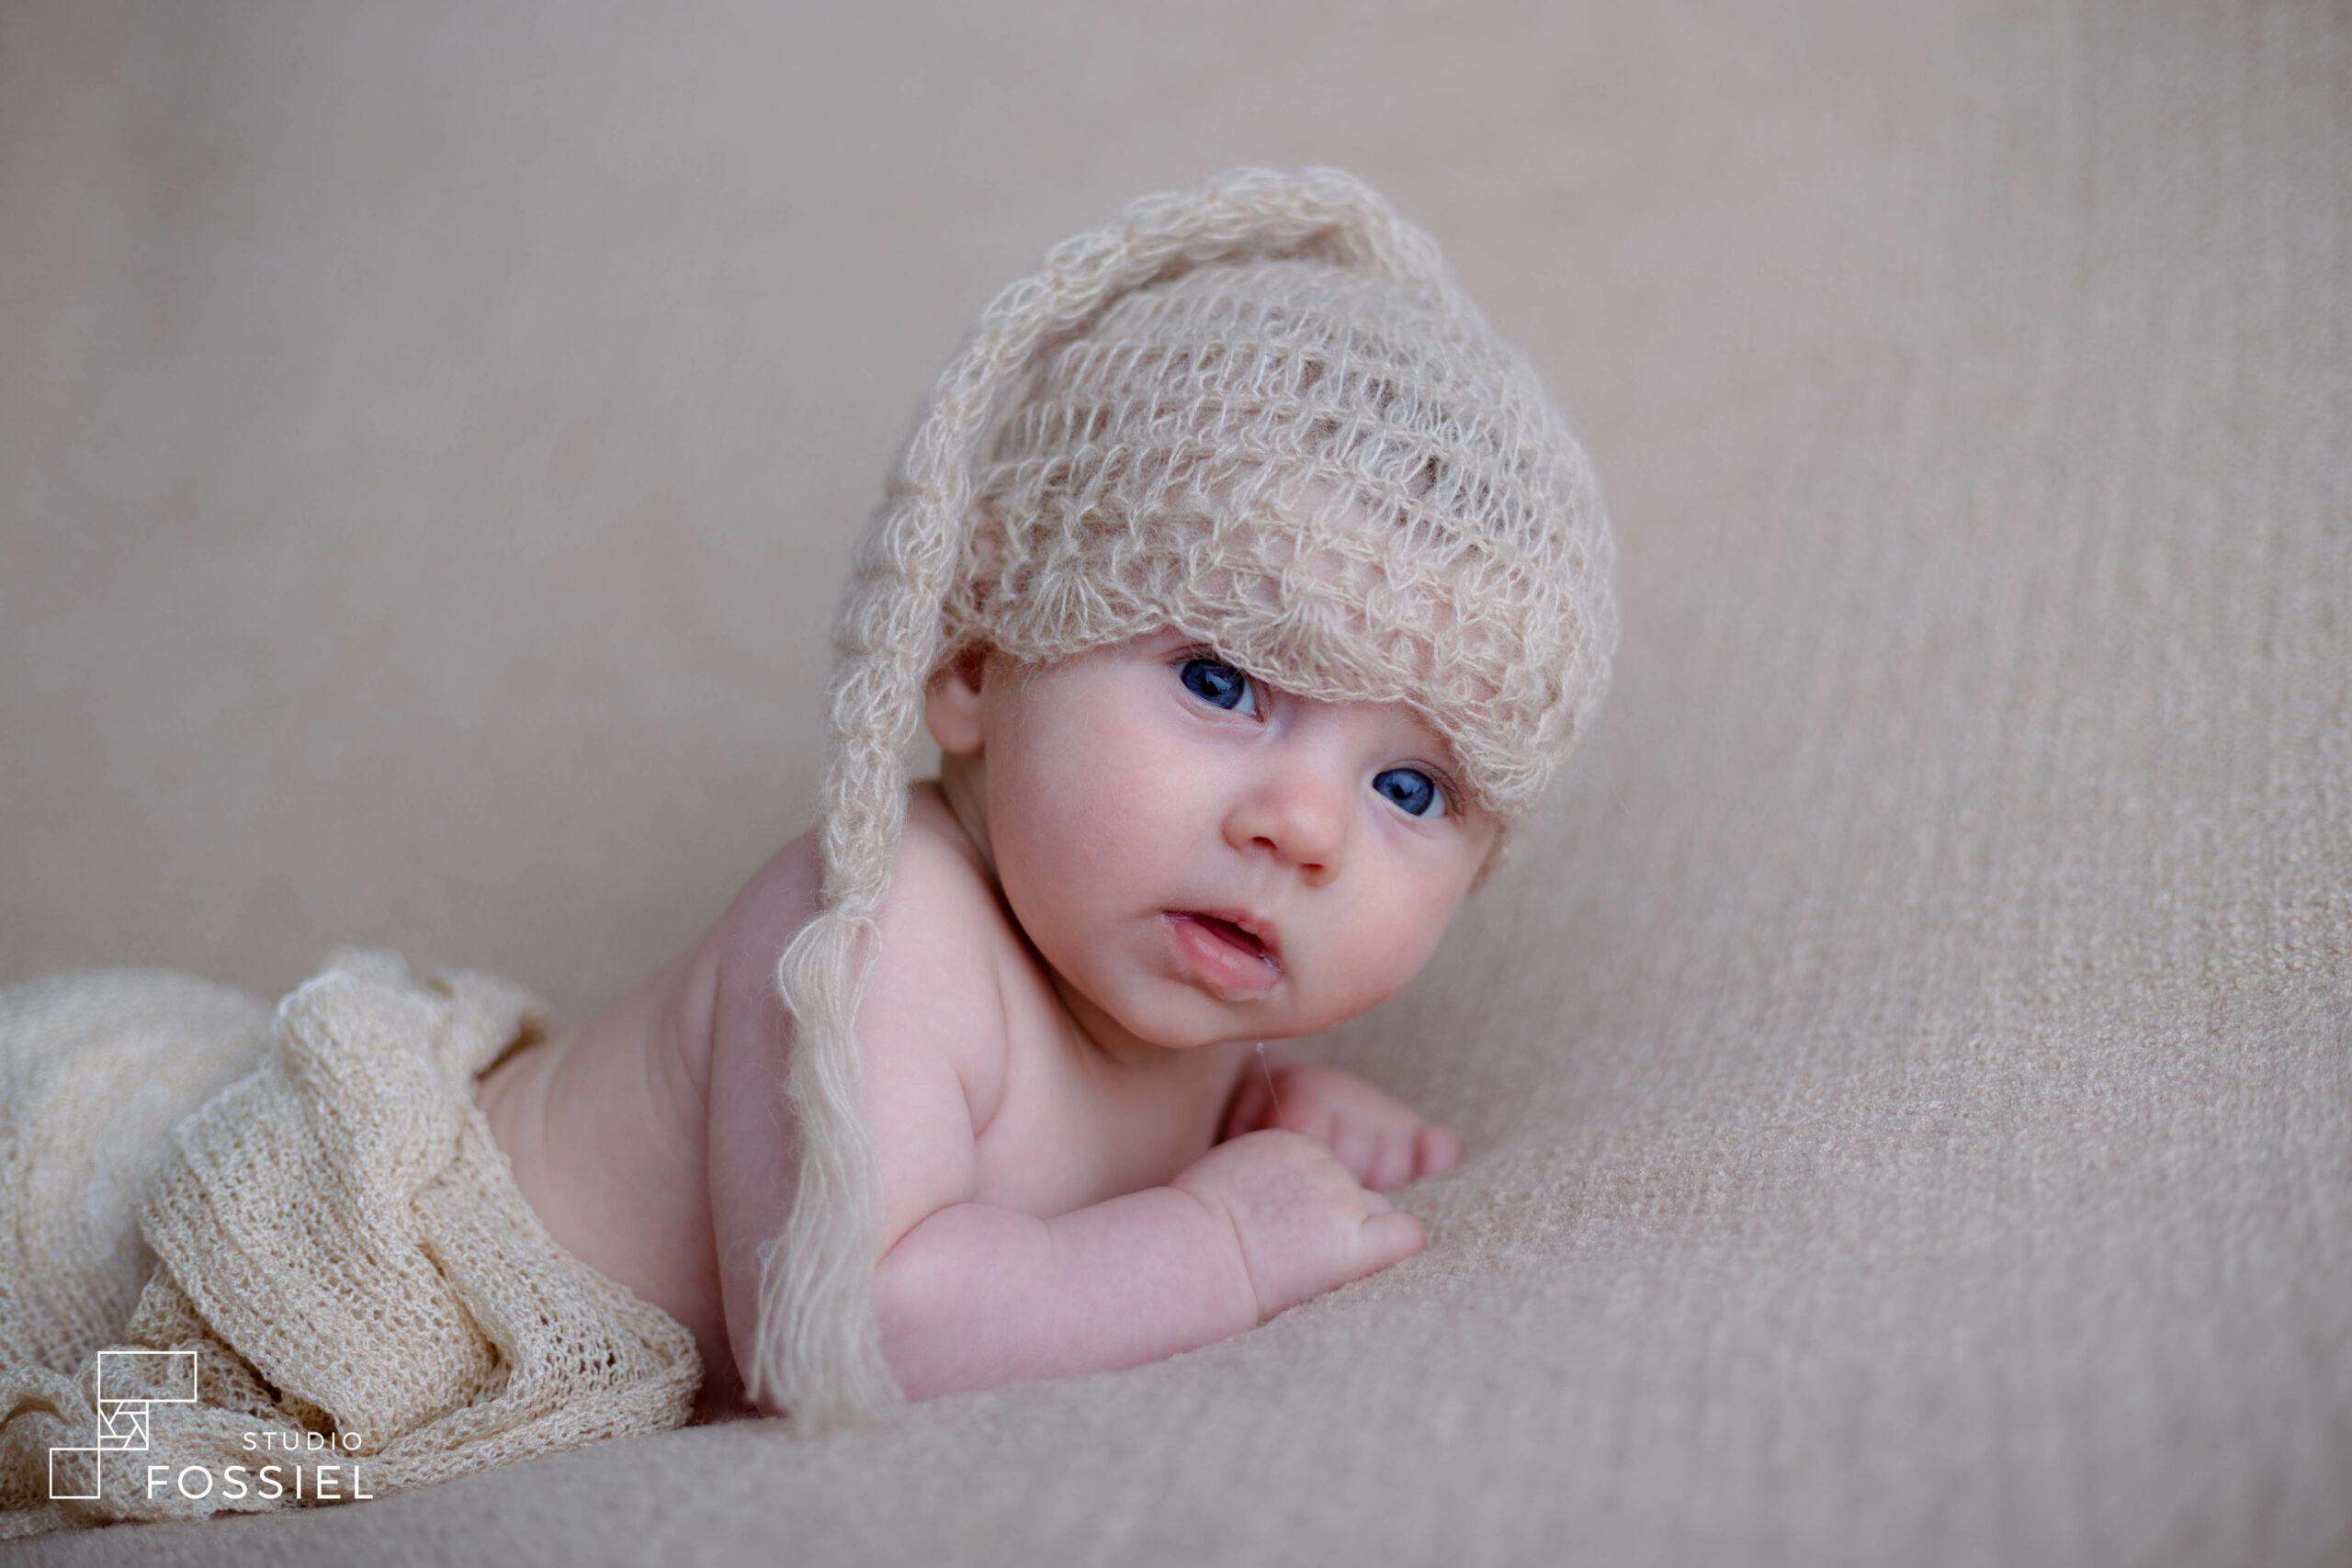 Studio Fossiel - Newborn fotografie